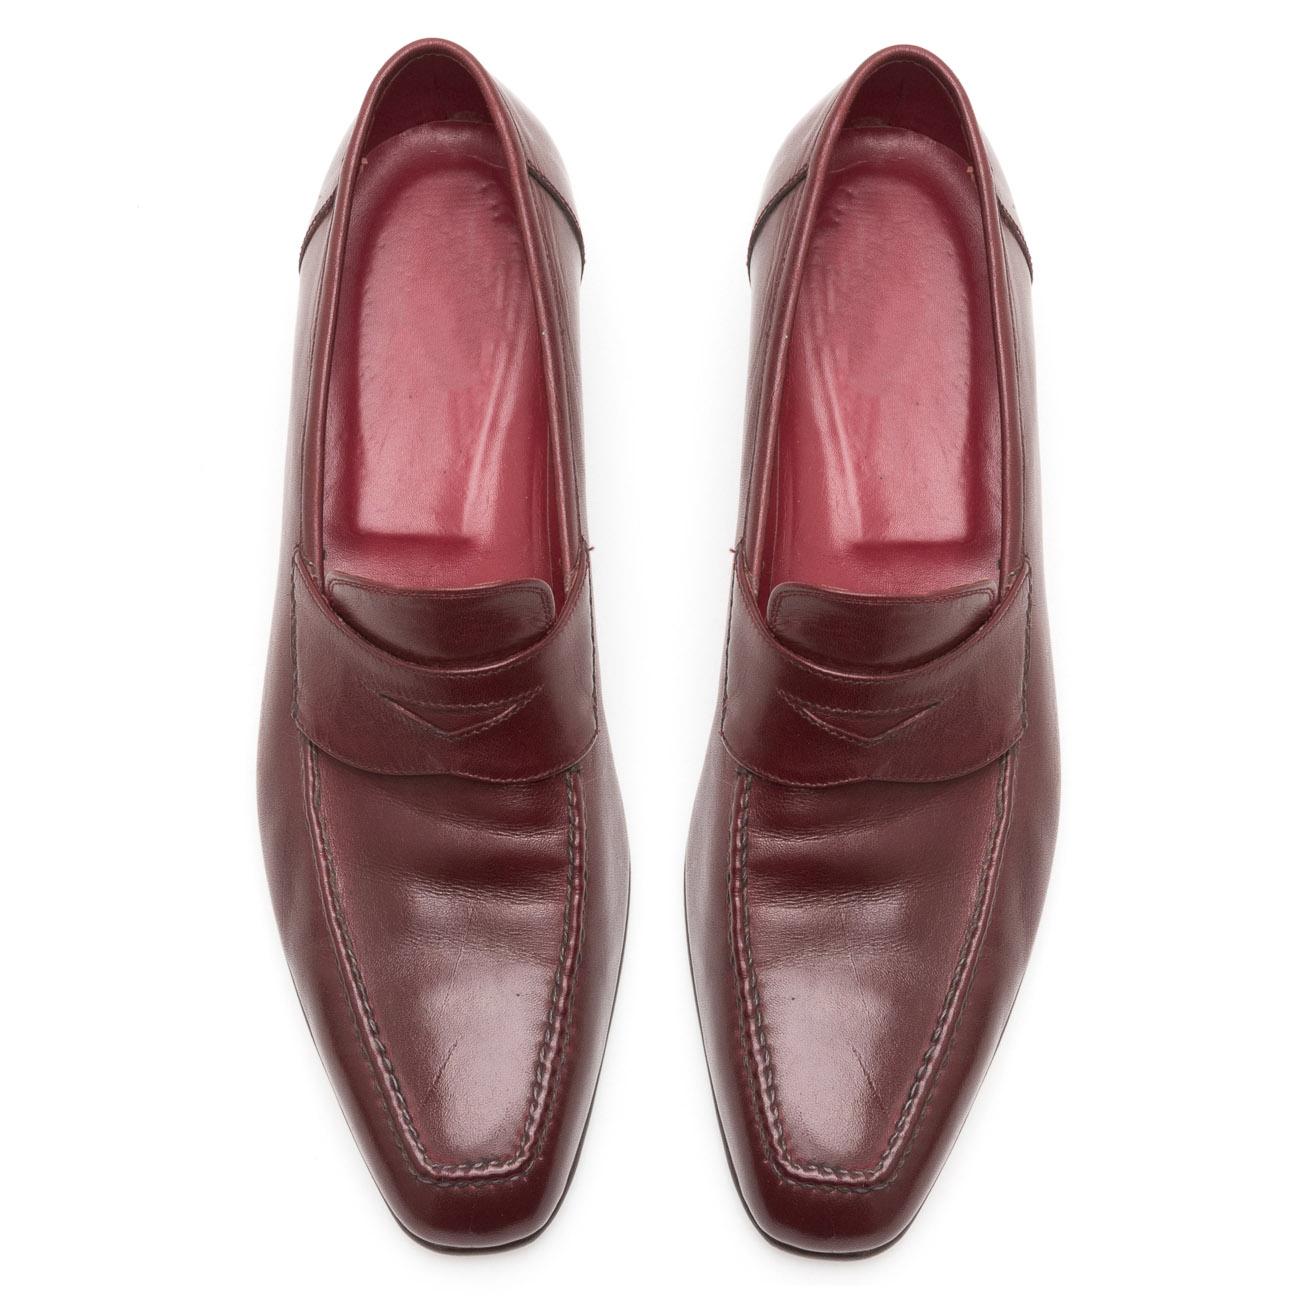 628d1c1c8b Mocassino donna Audrey | Calzoleria Petrocchi, scarpe artigianali a Roma